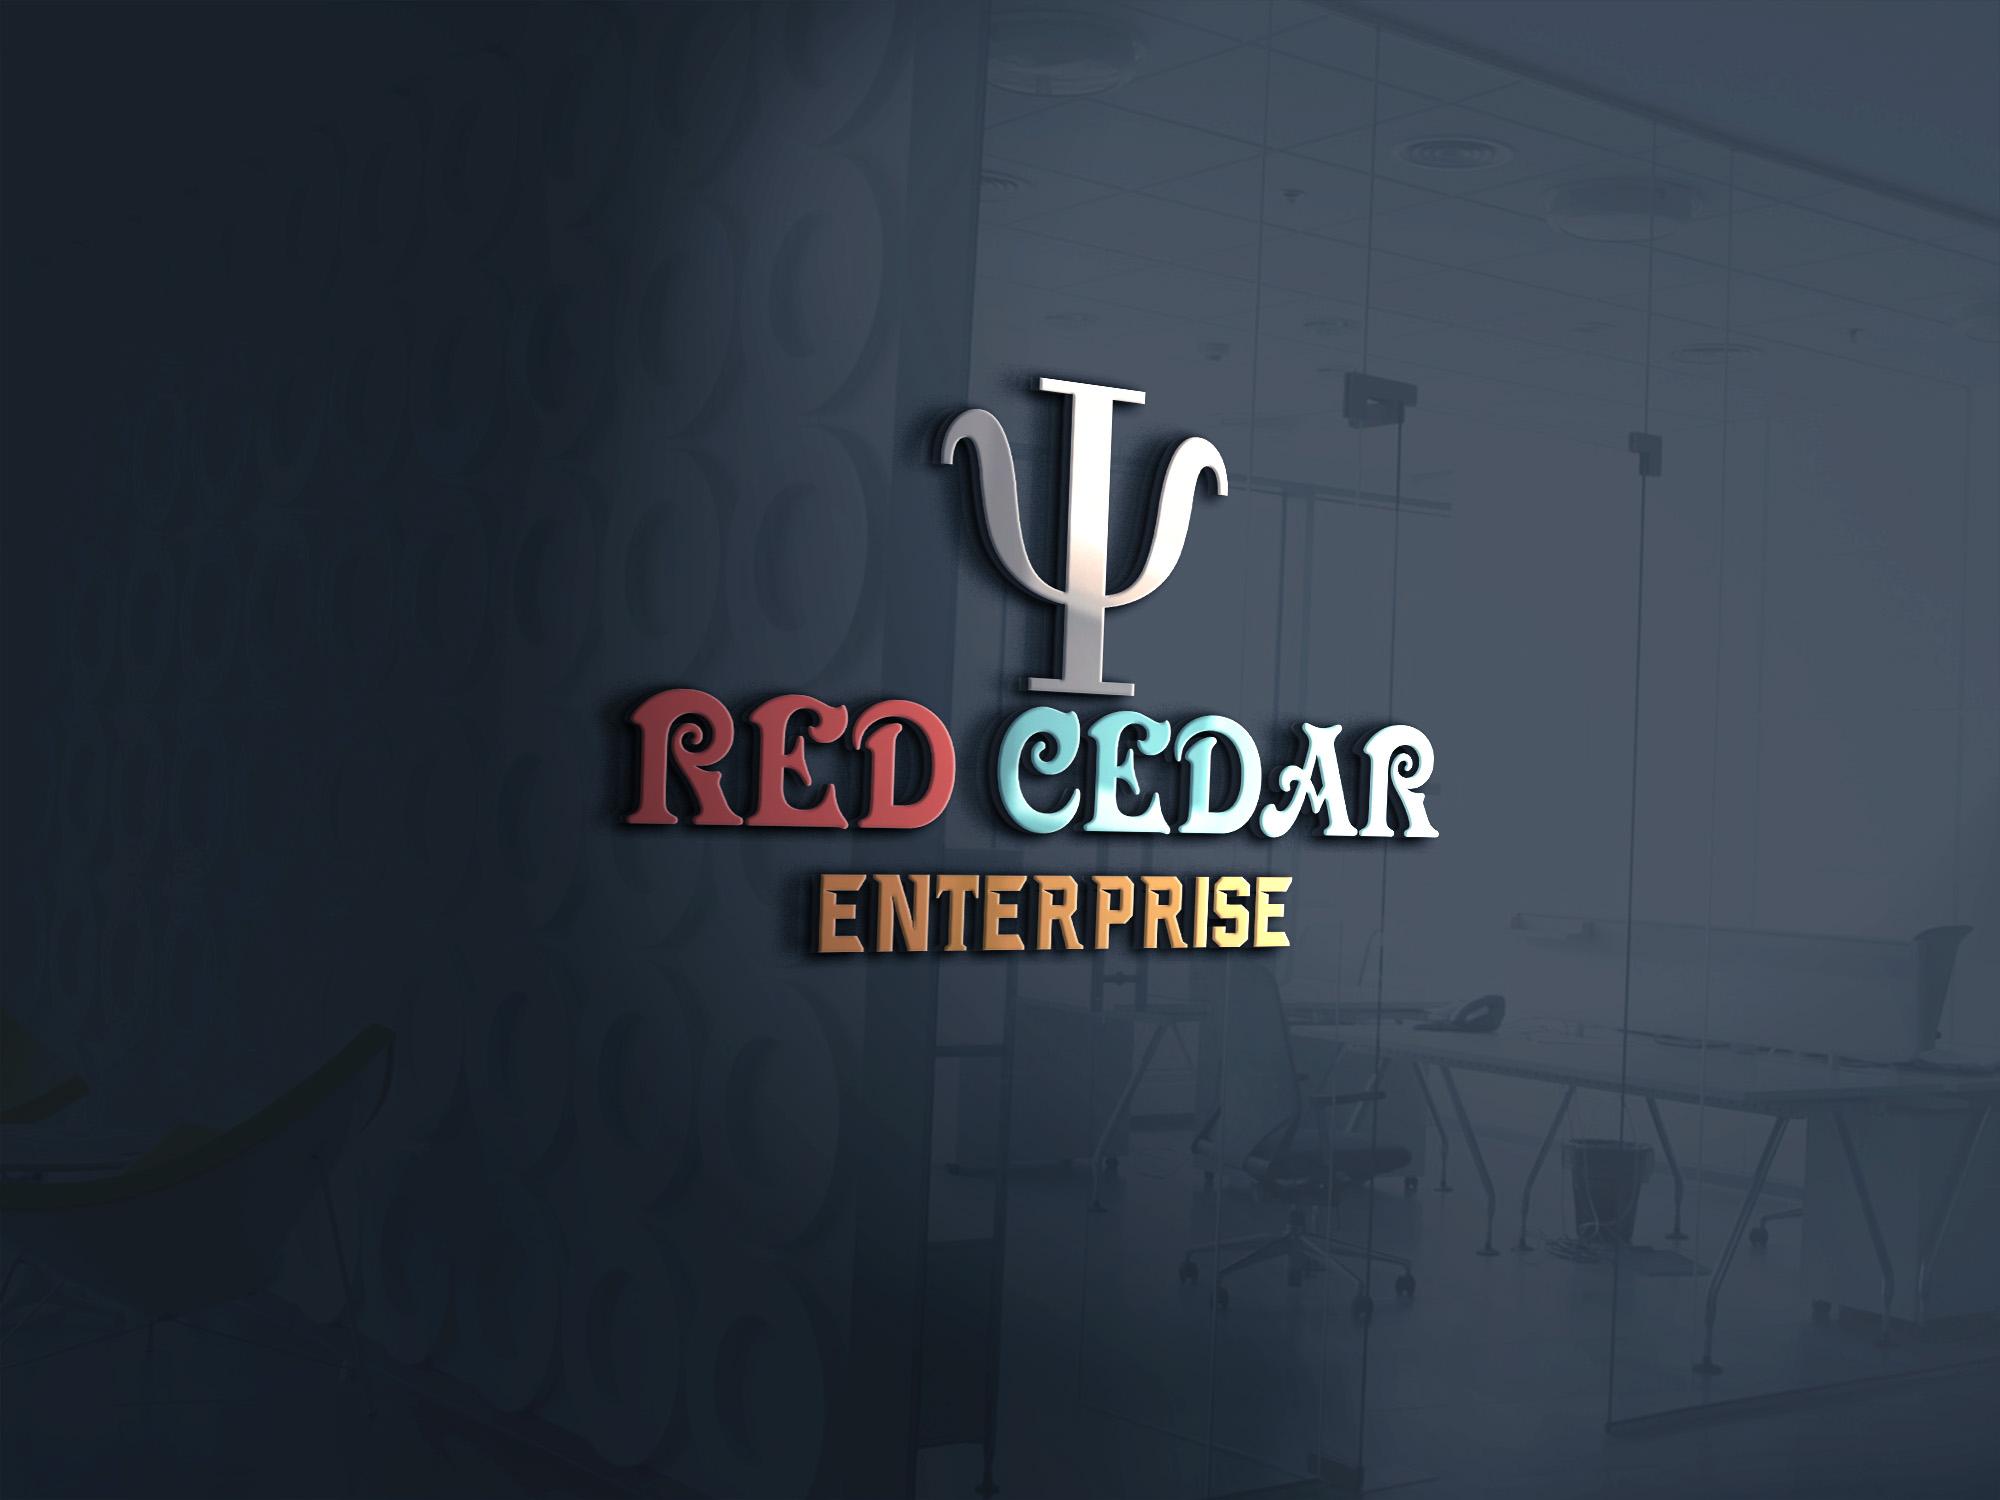 Logo Design by umair - Entry No. 42 in the Logo Design Contest Unique Logo Design Wanted for Red Cedar Enterprise.